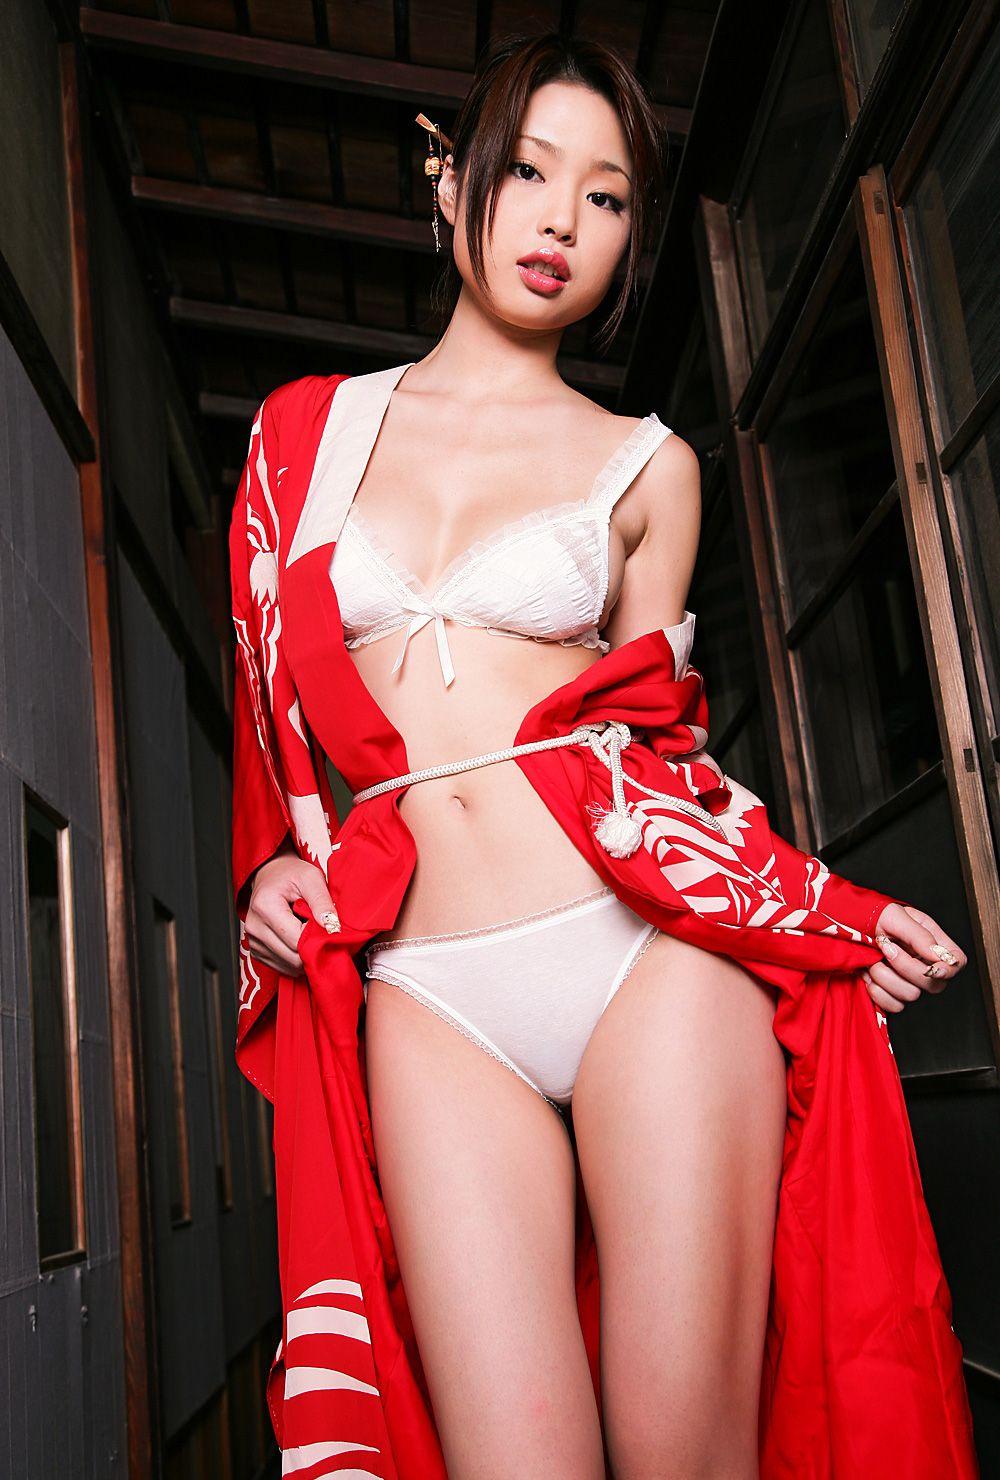 Risa Kasumi Images